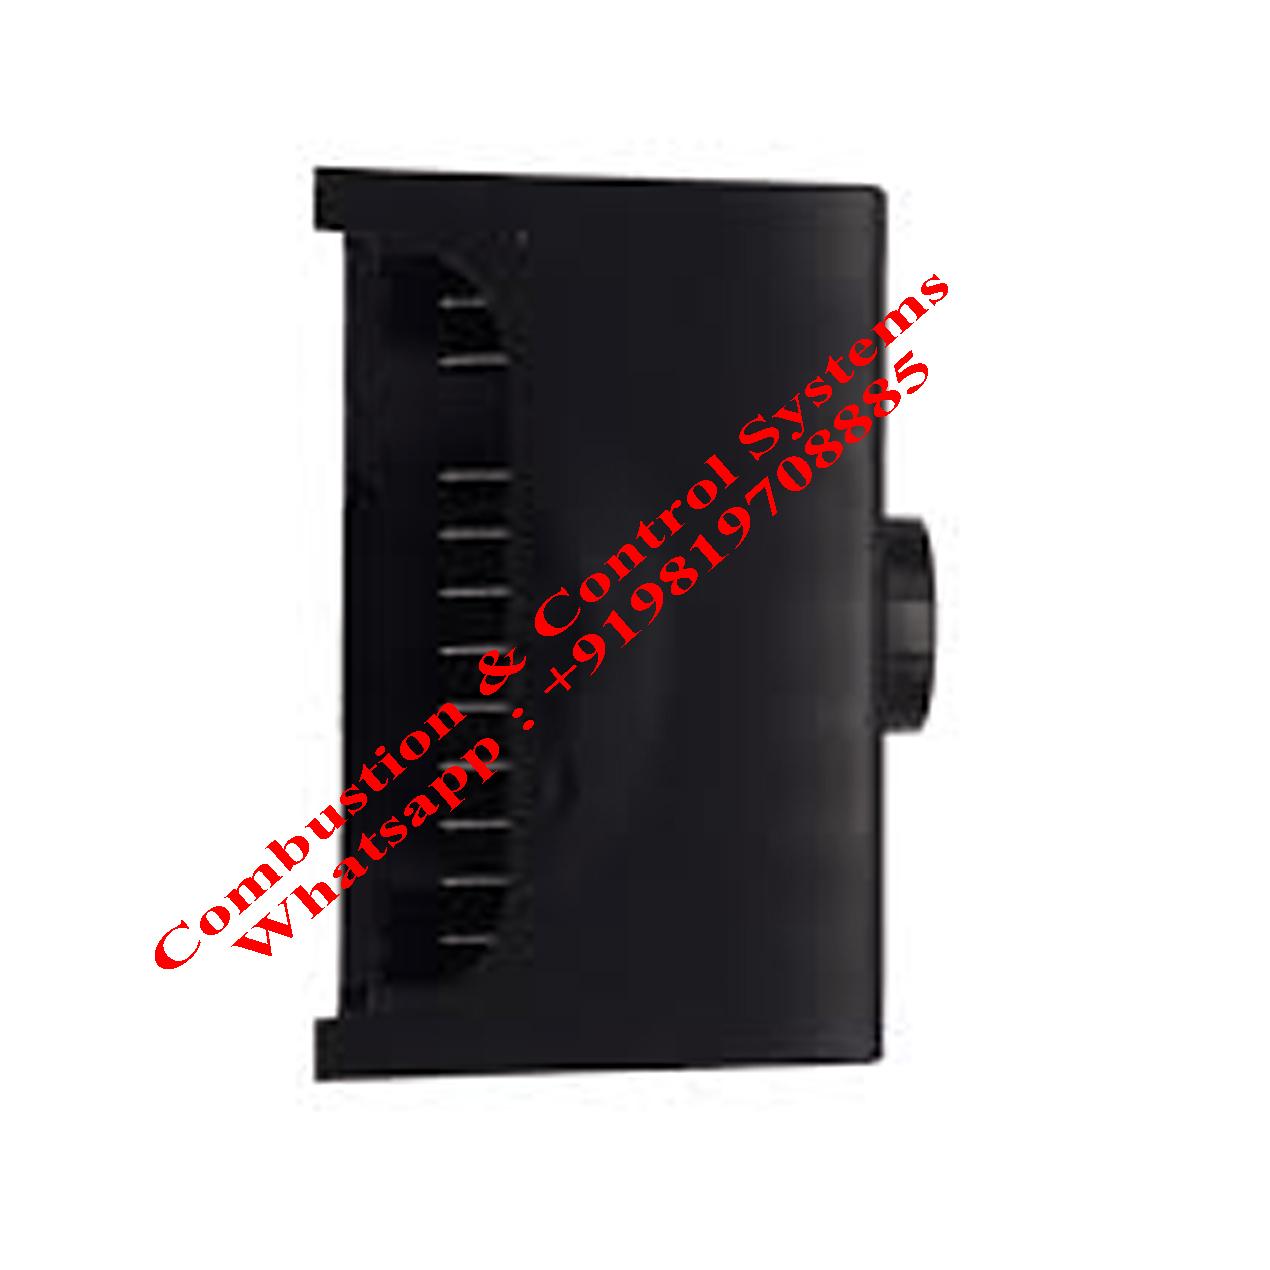 Siemens LME21 burner control box